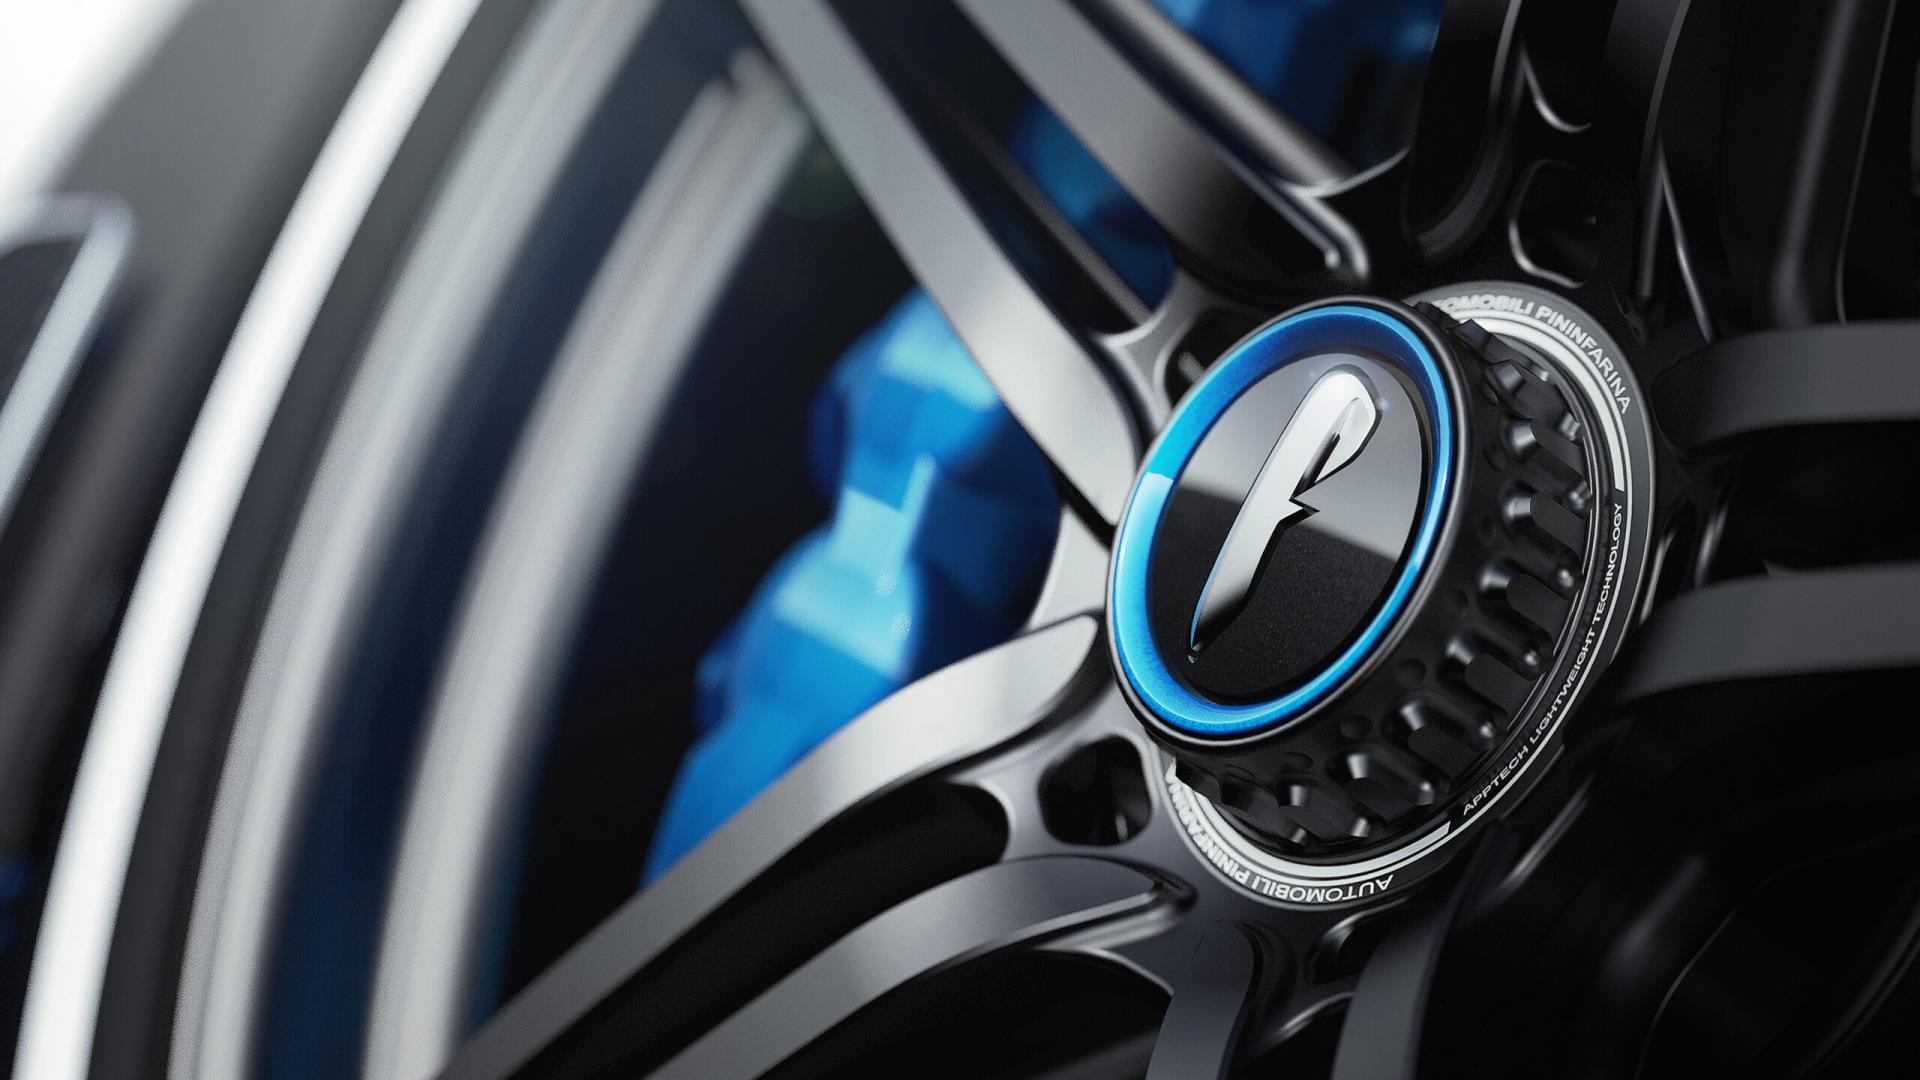 Pininfarina Battista Anniversario 2020 velg wiel naaf